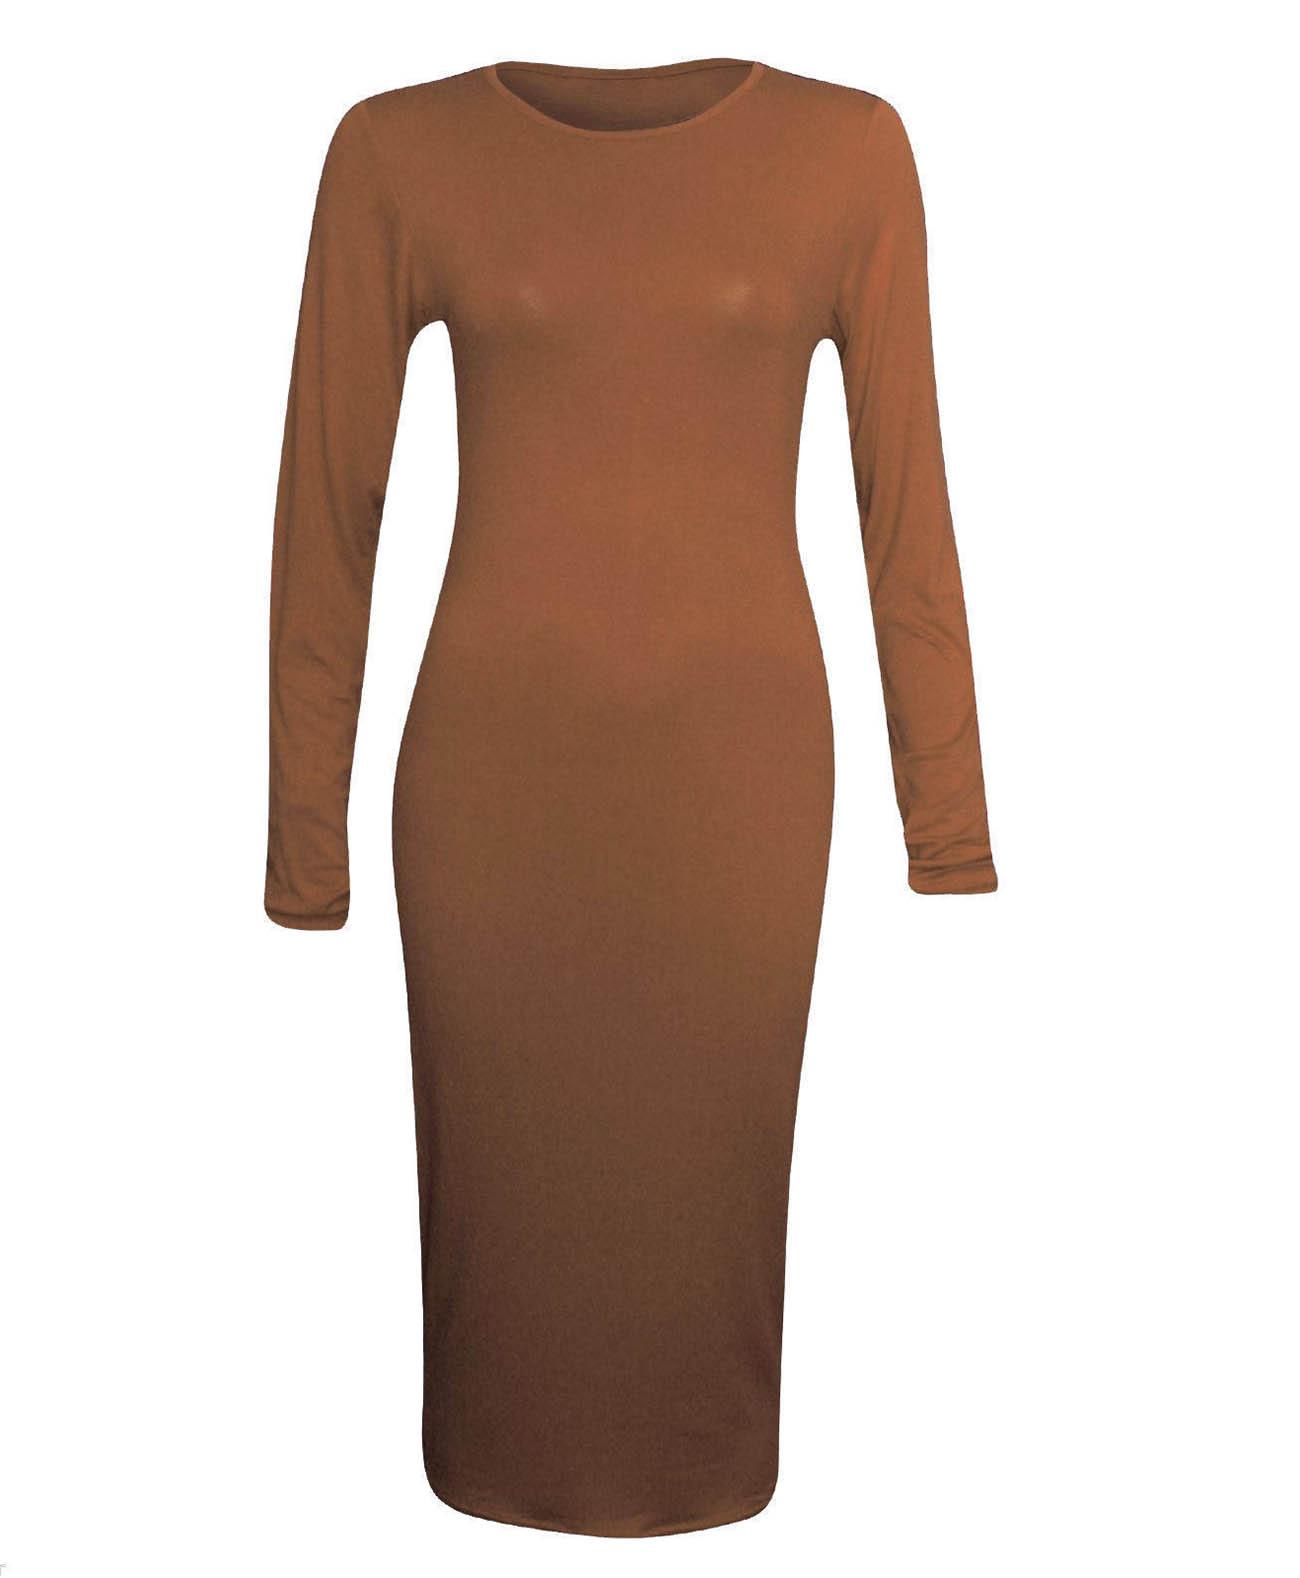 Long Sleeve Bodycon Dress Brown – Soha MT Collection 57dd3bde8769